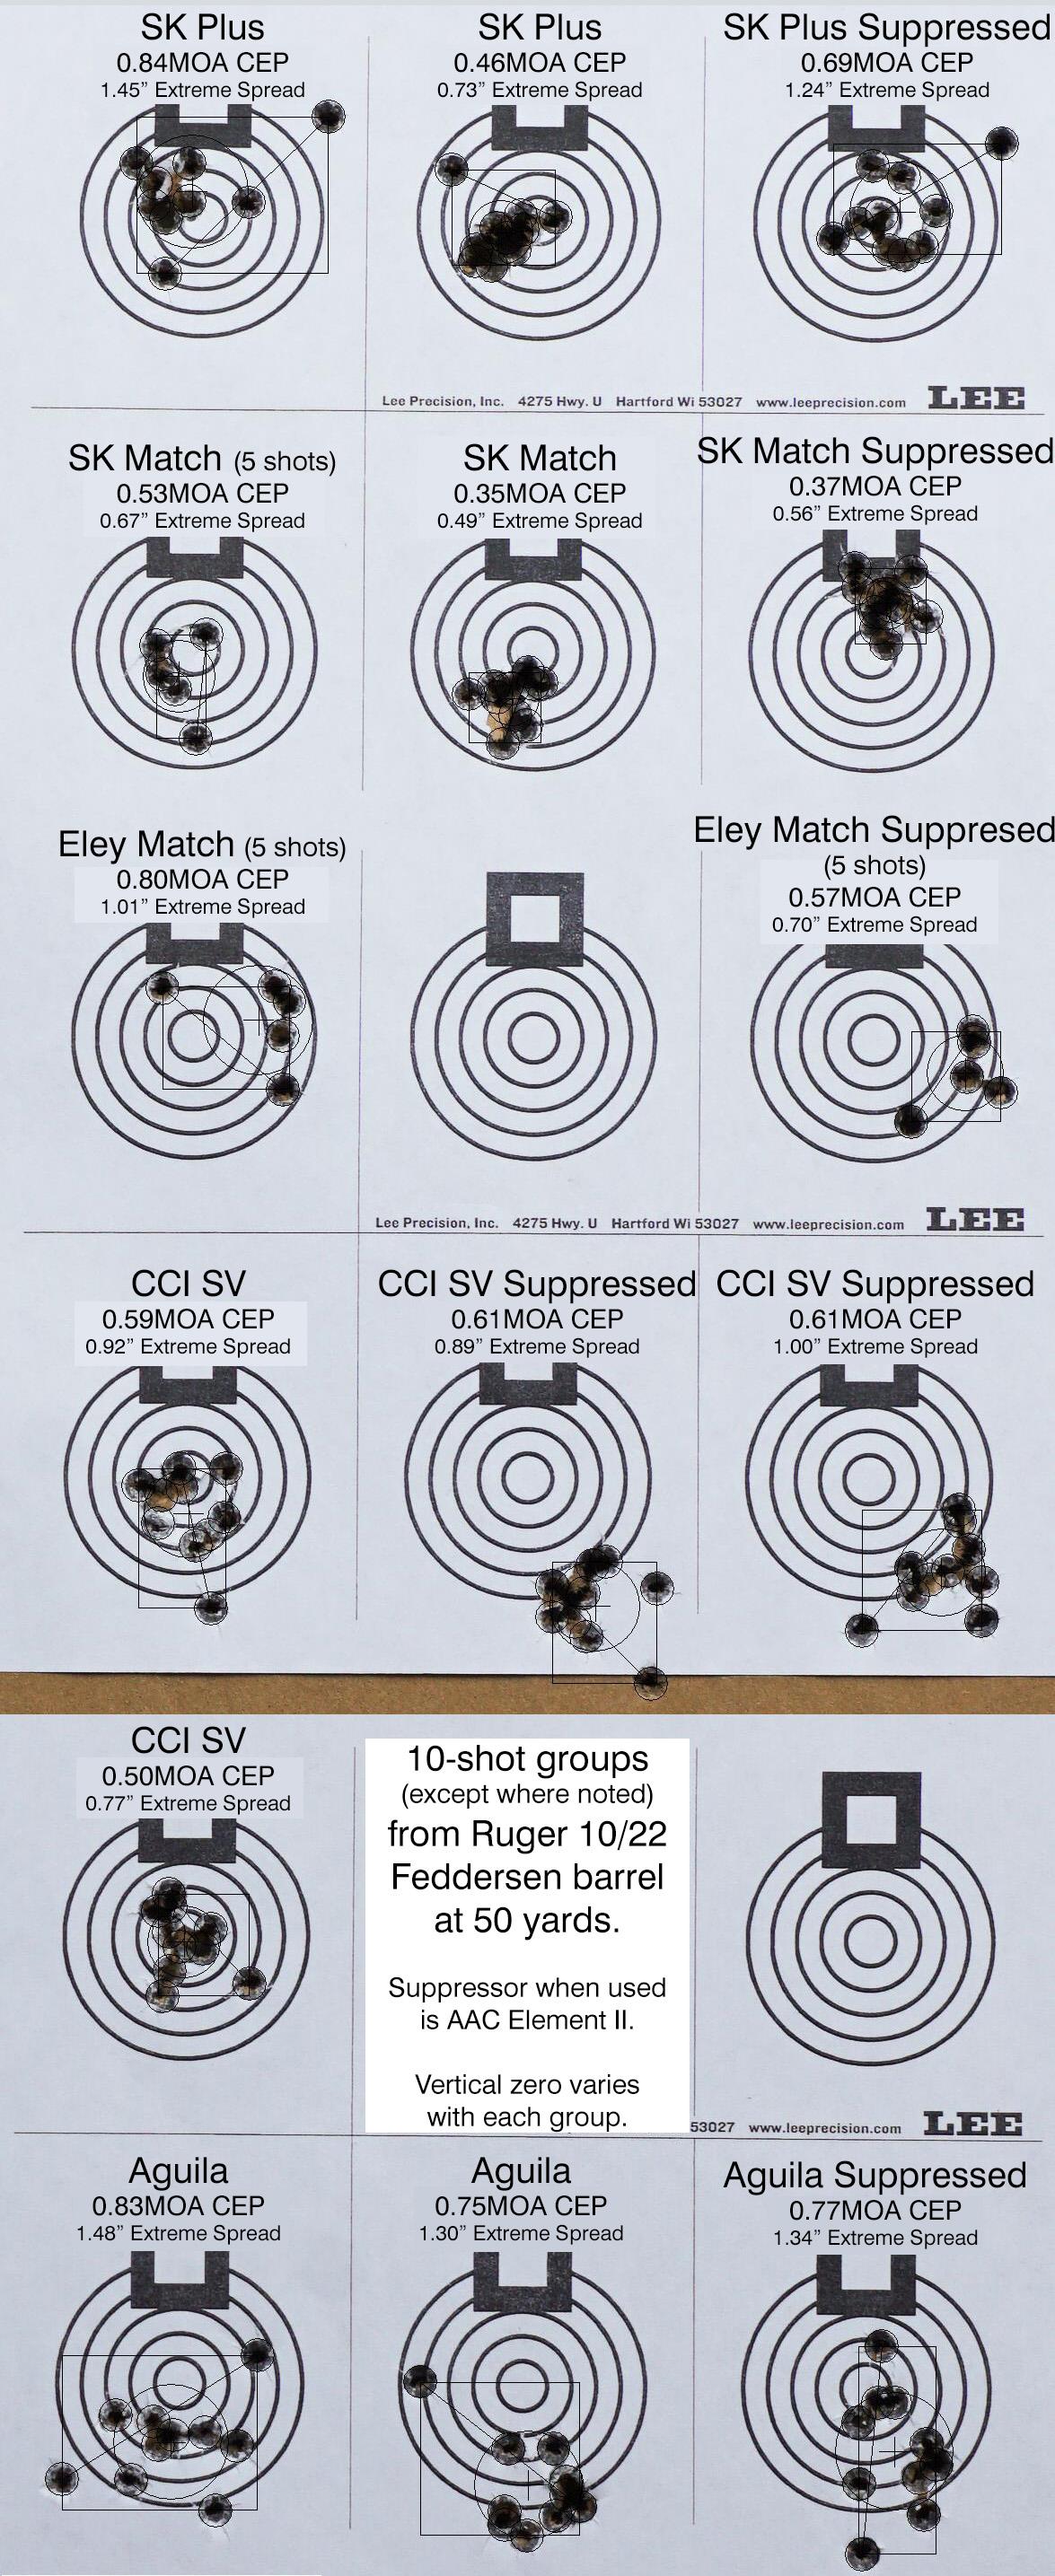 Feddersen targets